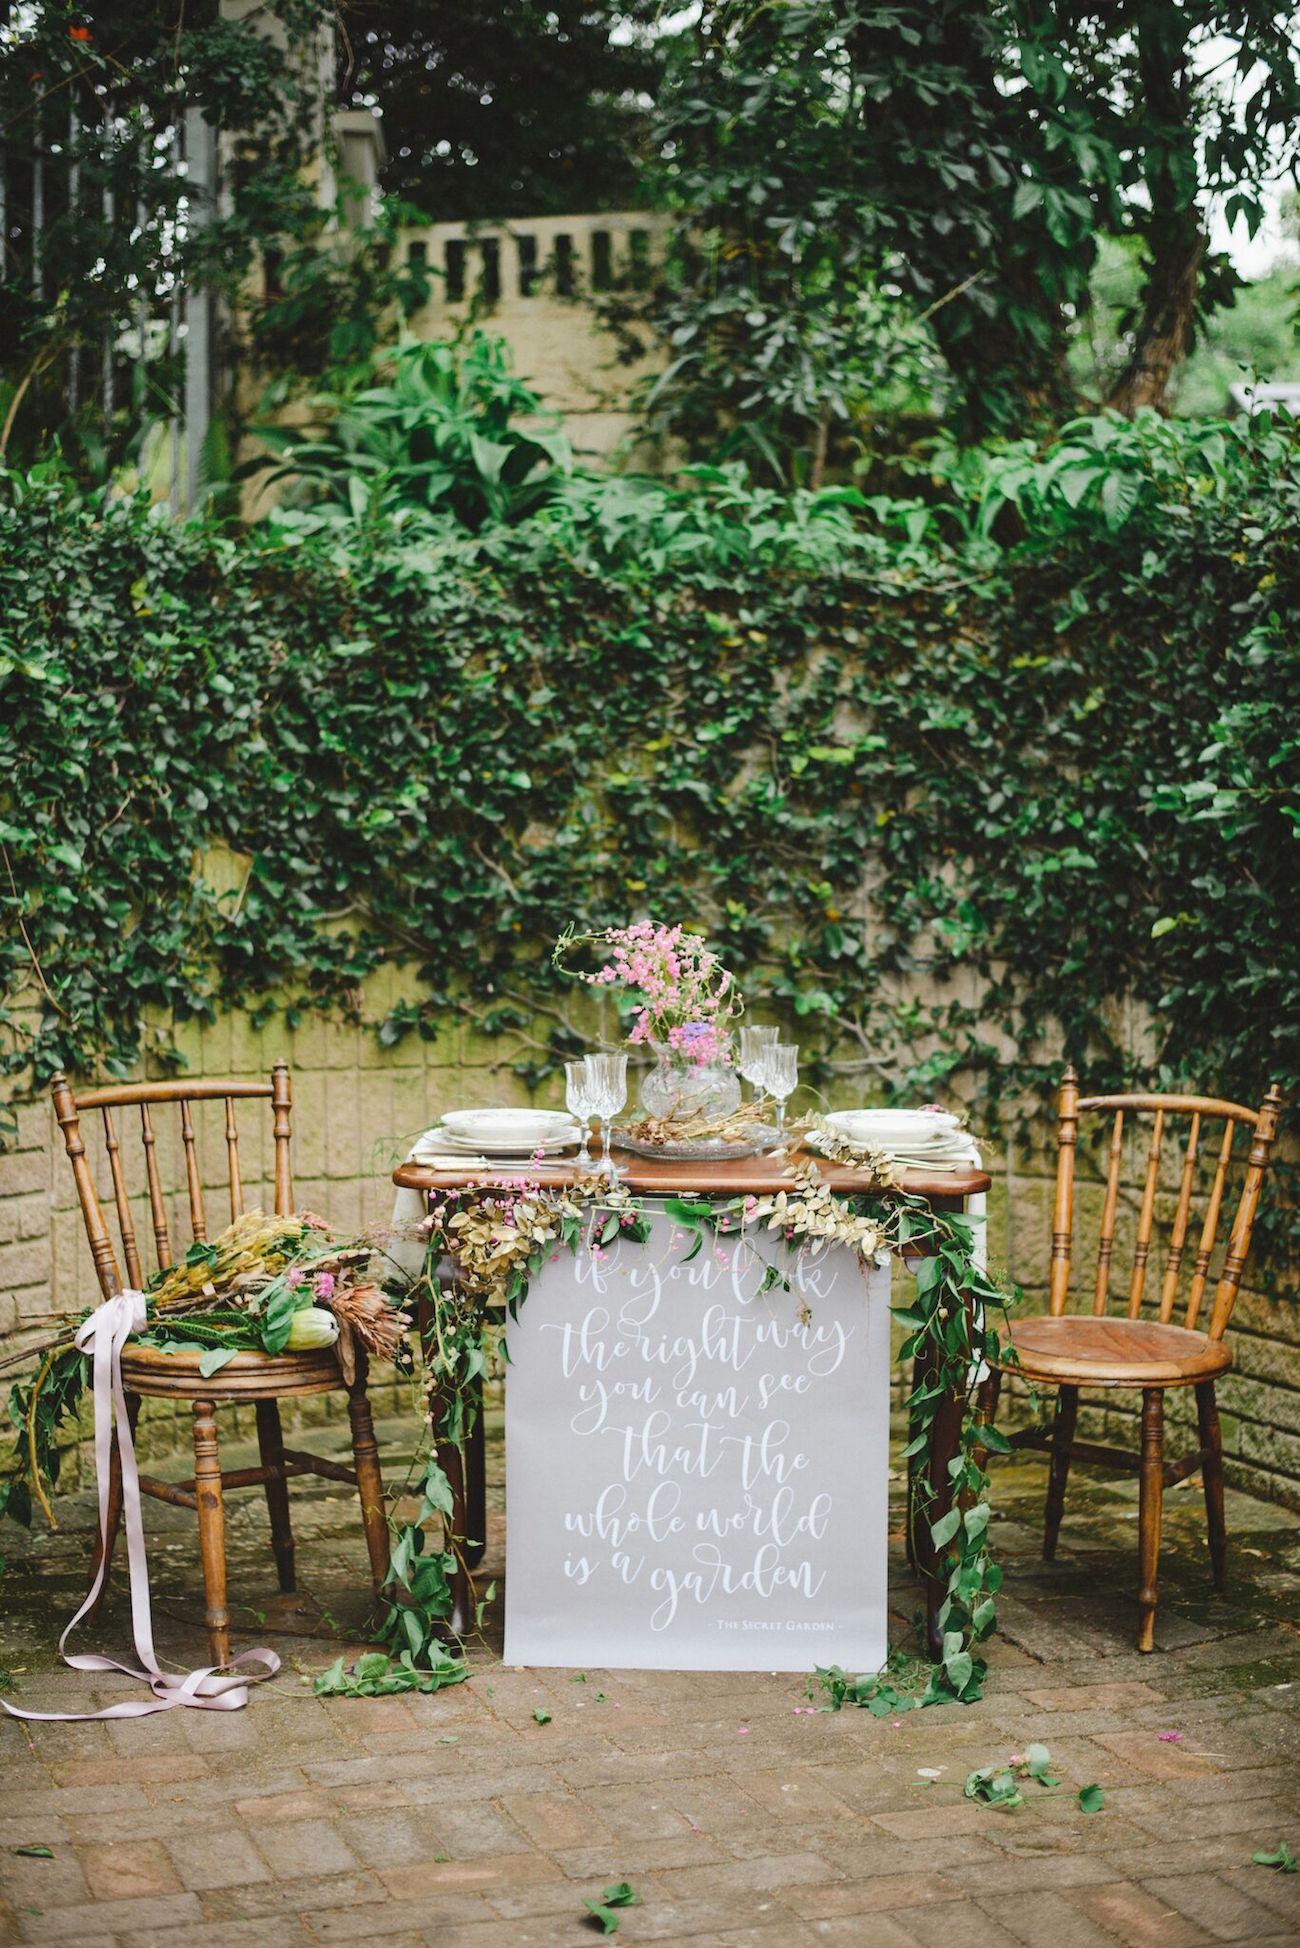 Secret Garden Wedding Table | Credit: Oh Happy Day & Roxanne Davison